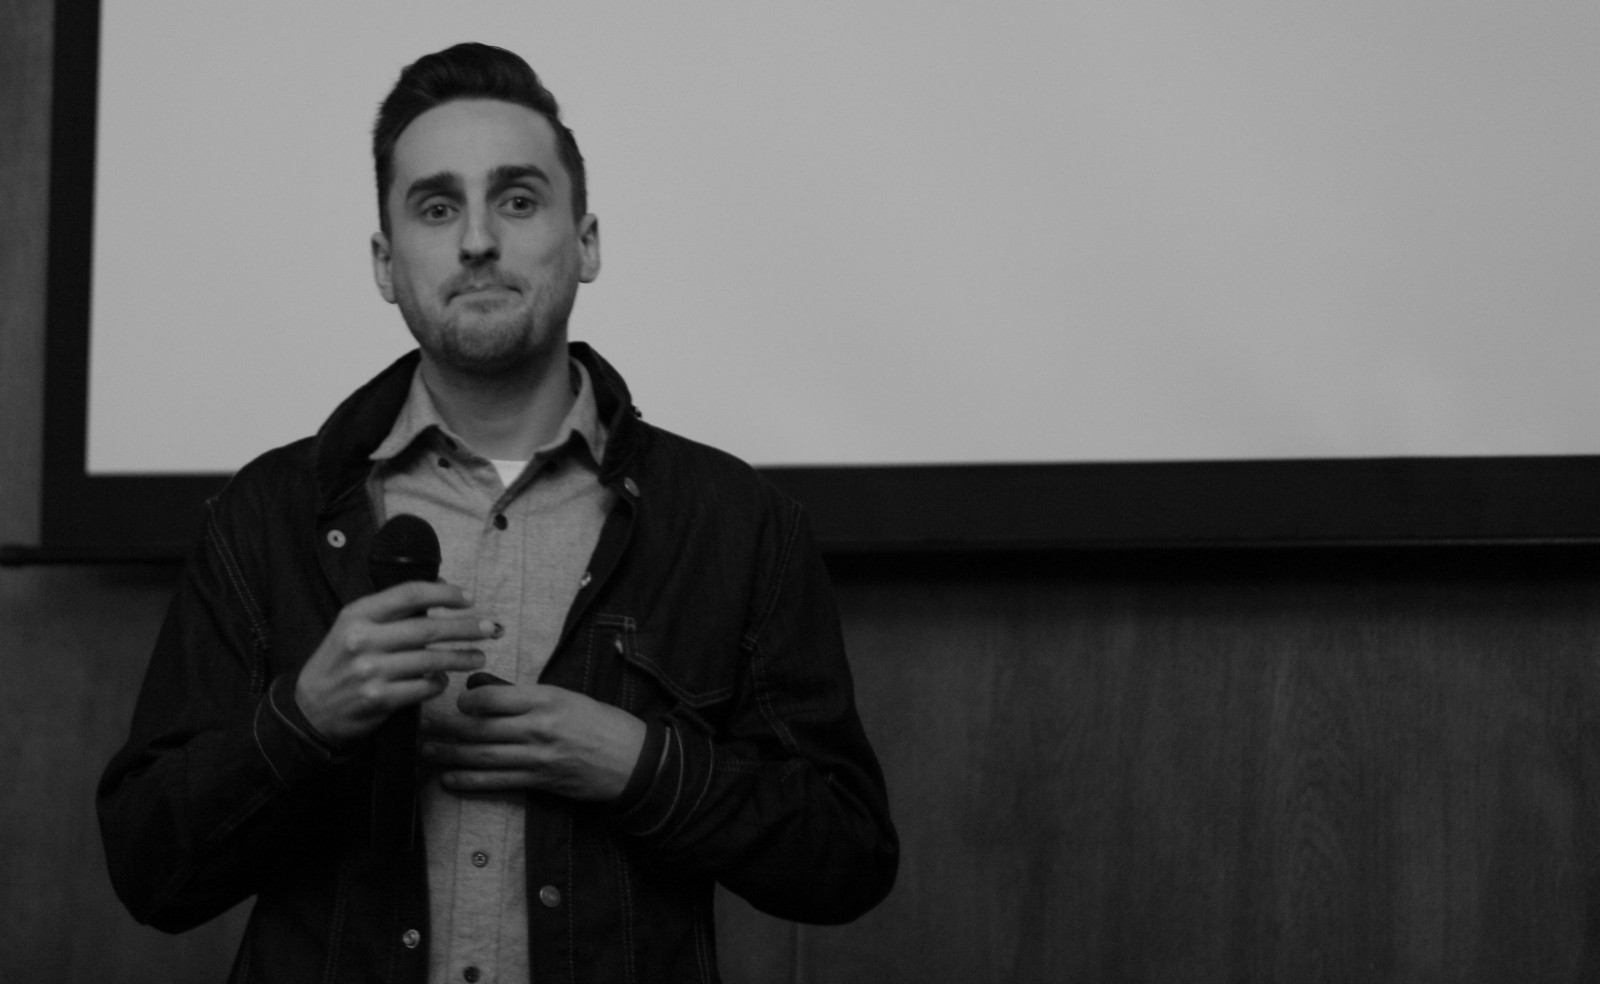 Phil America speaks at TEDX UC Davis on Saturday